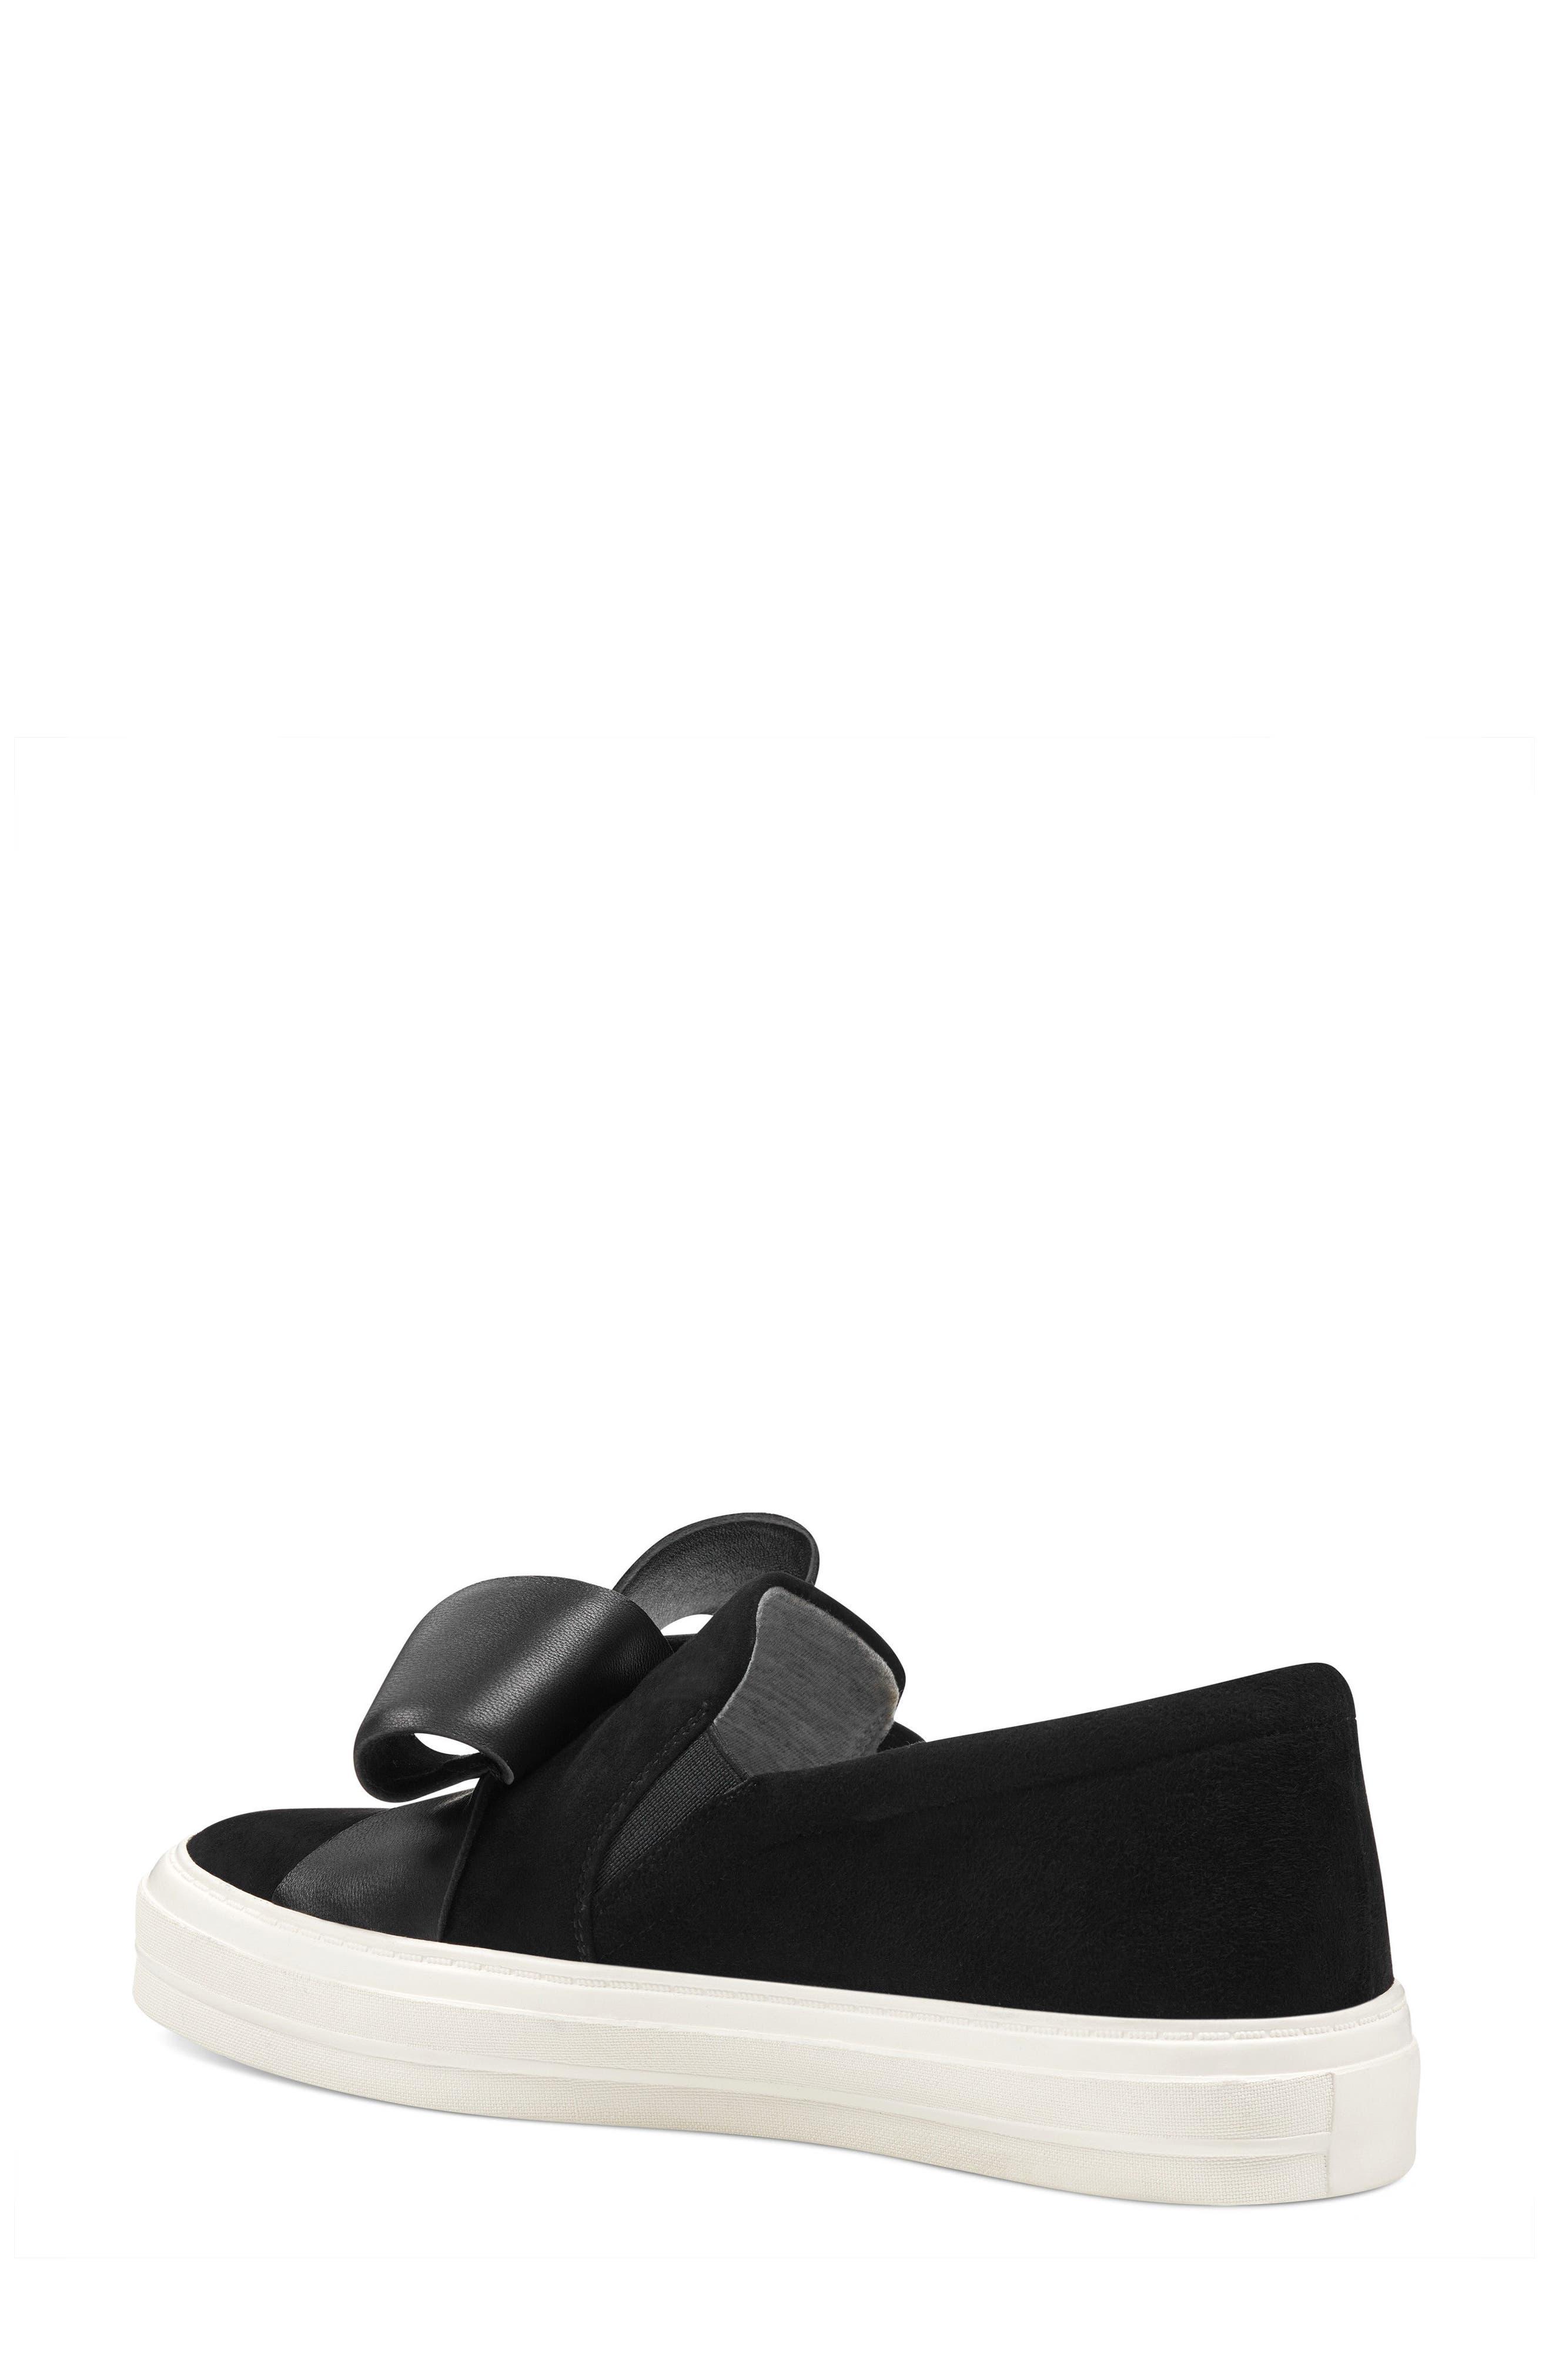 Odienella Slip-On Sneaker,                             Alternate thumbnail 2, color,                             BLACK MULTI SUEDE